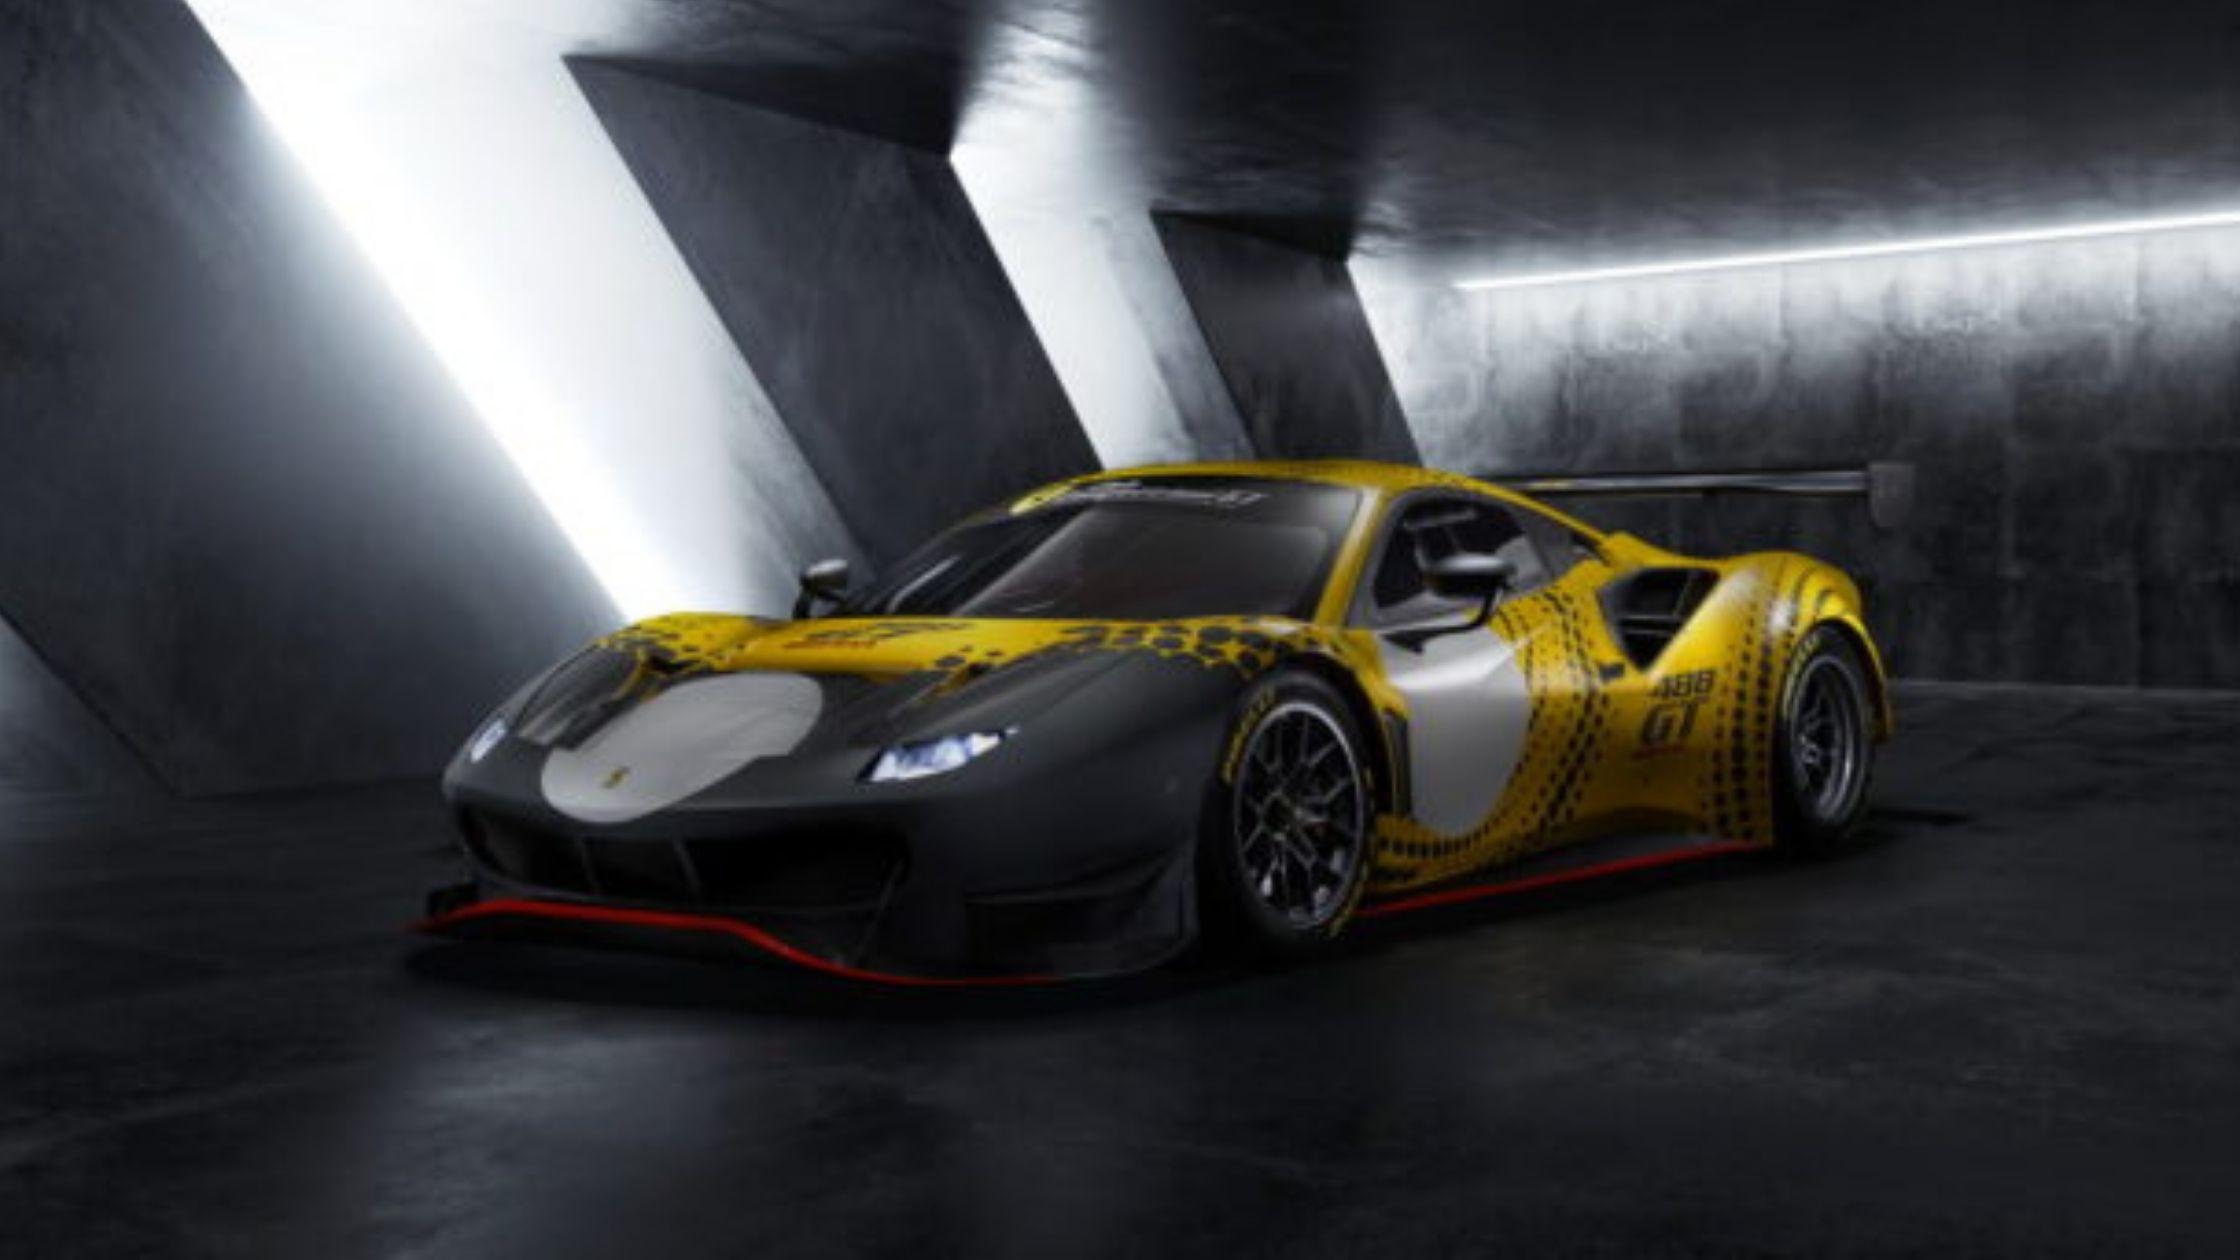 Modified Ferrari 488 Gt The New Cavallino Track Car Car To Buy